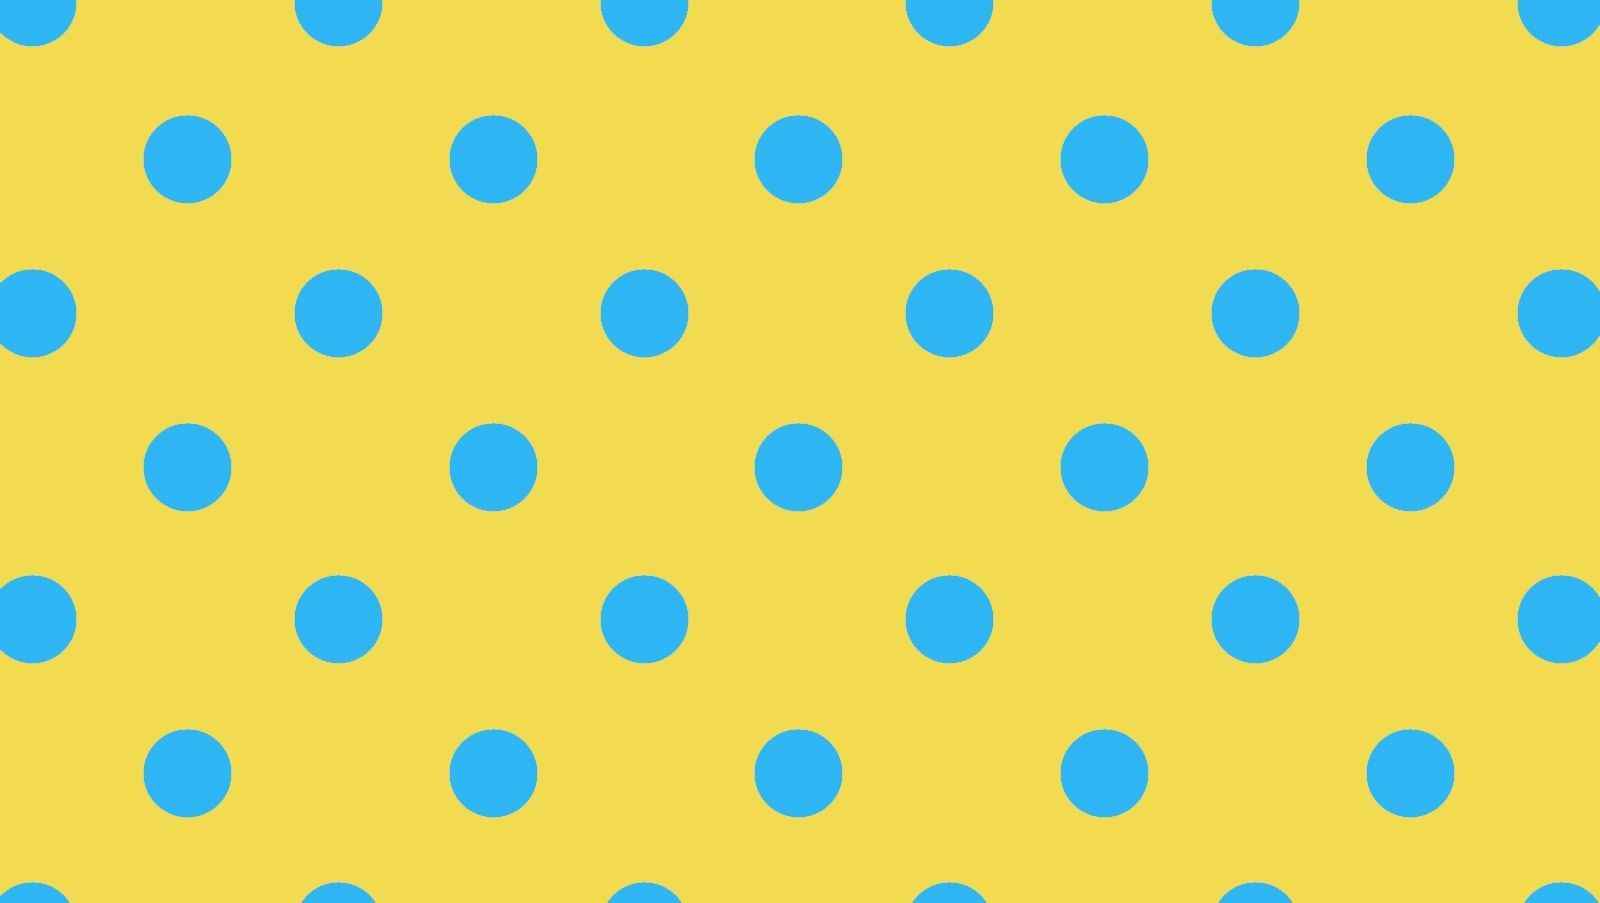 Polka Dot Background Yellow Blue Wallpaper Wallpaper Download Polka Polka Dots Wallpaper Dots Wallpaper Polka Dot Background